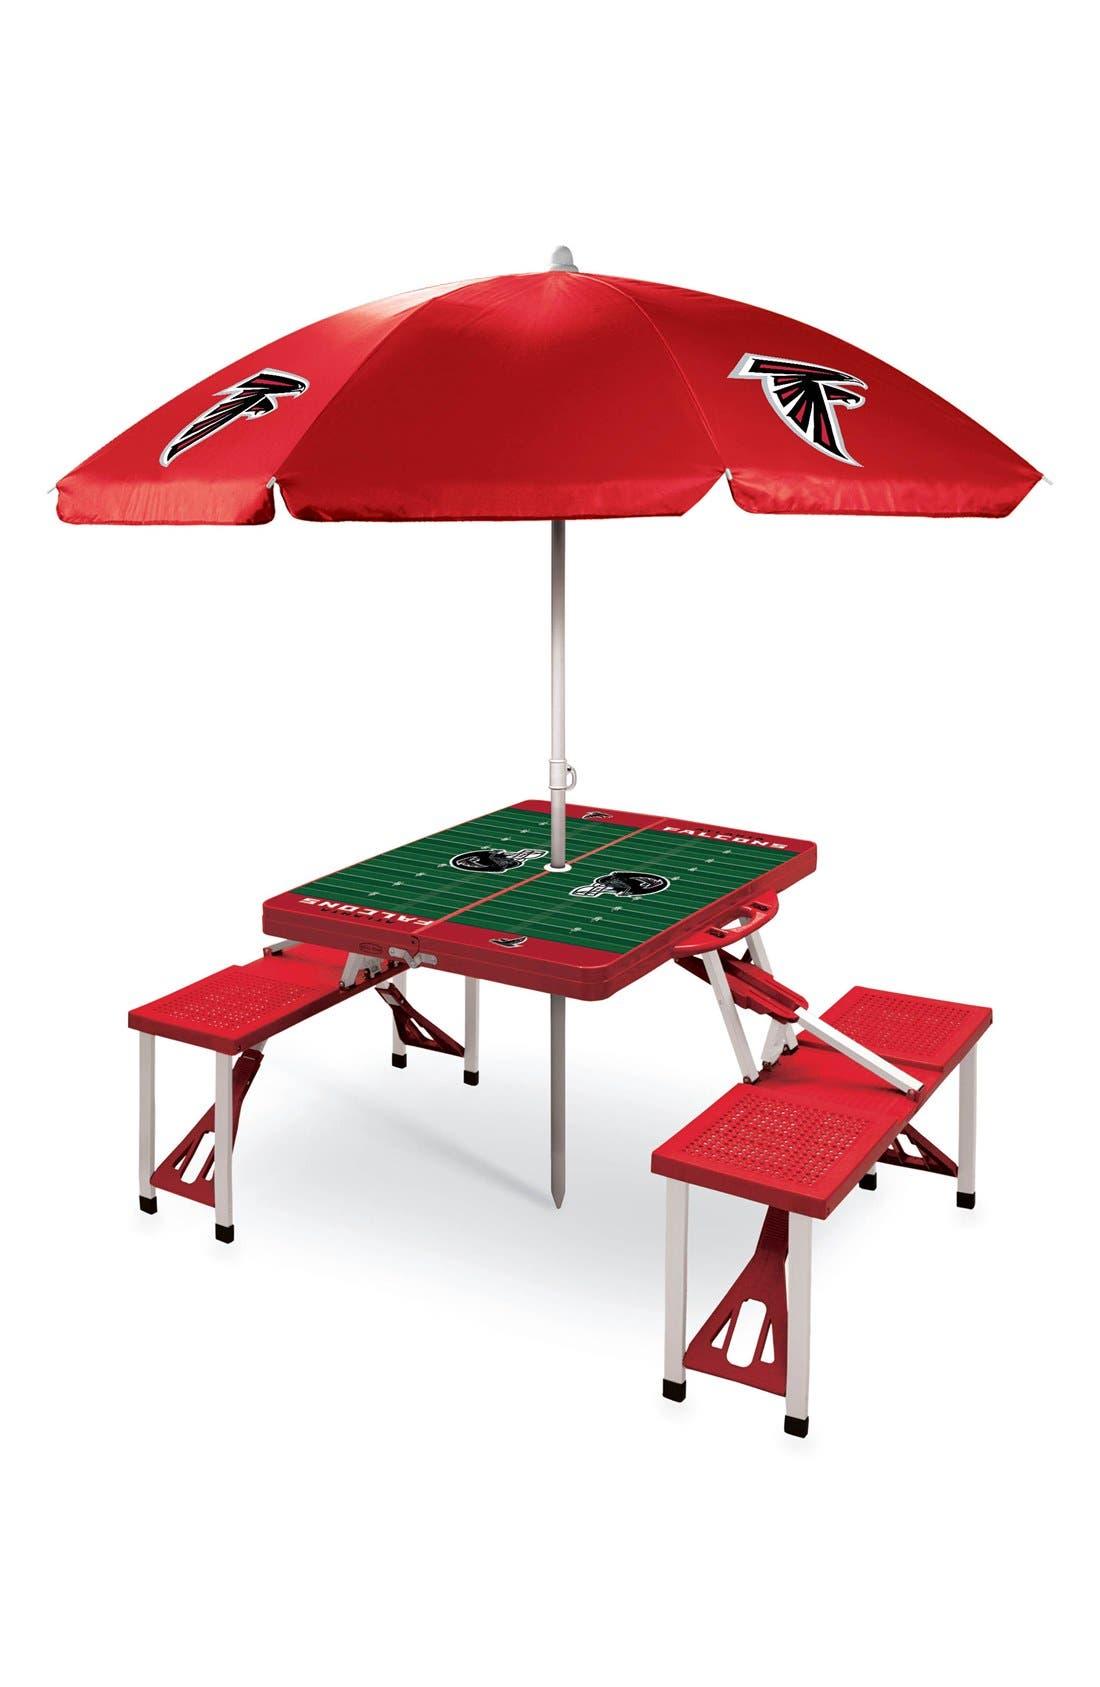 Picnic Time Team Football Field Design Portable Picnic Table with Umbrella